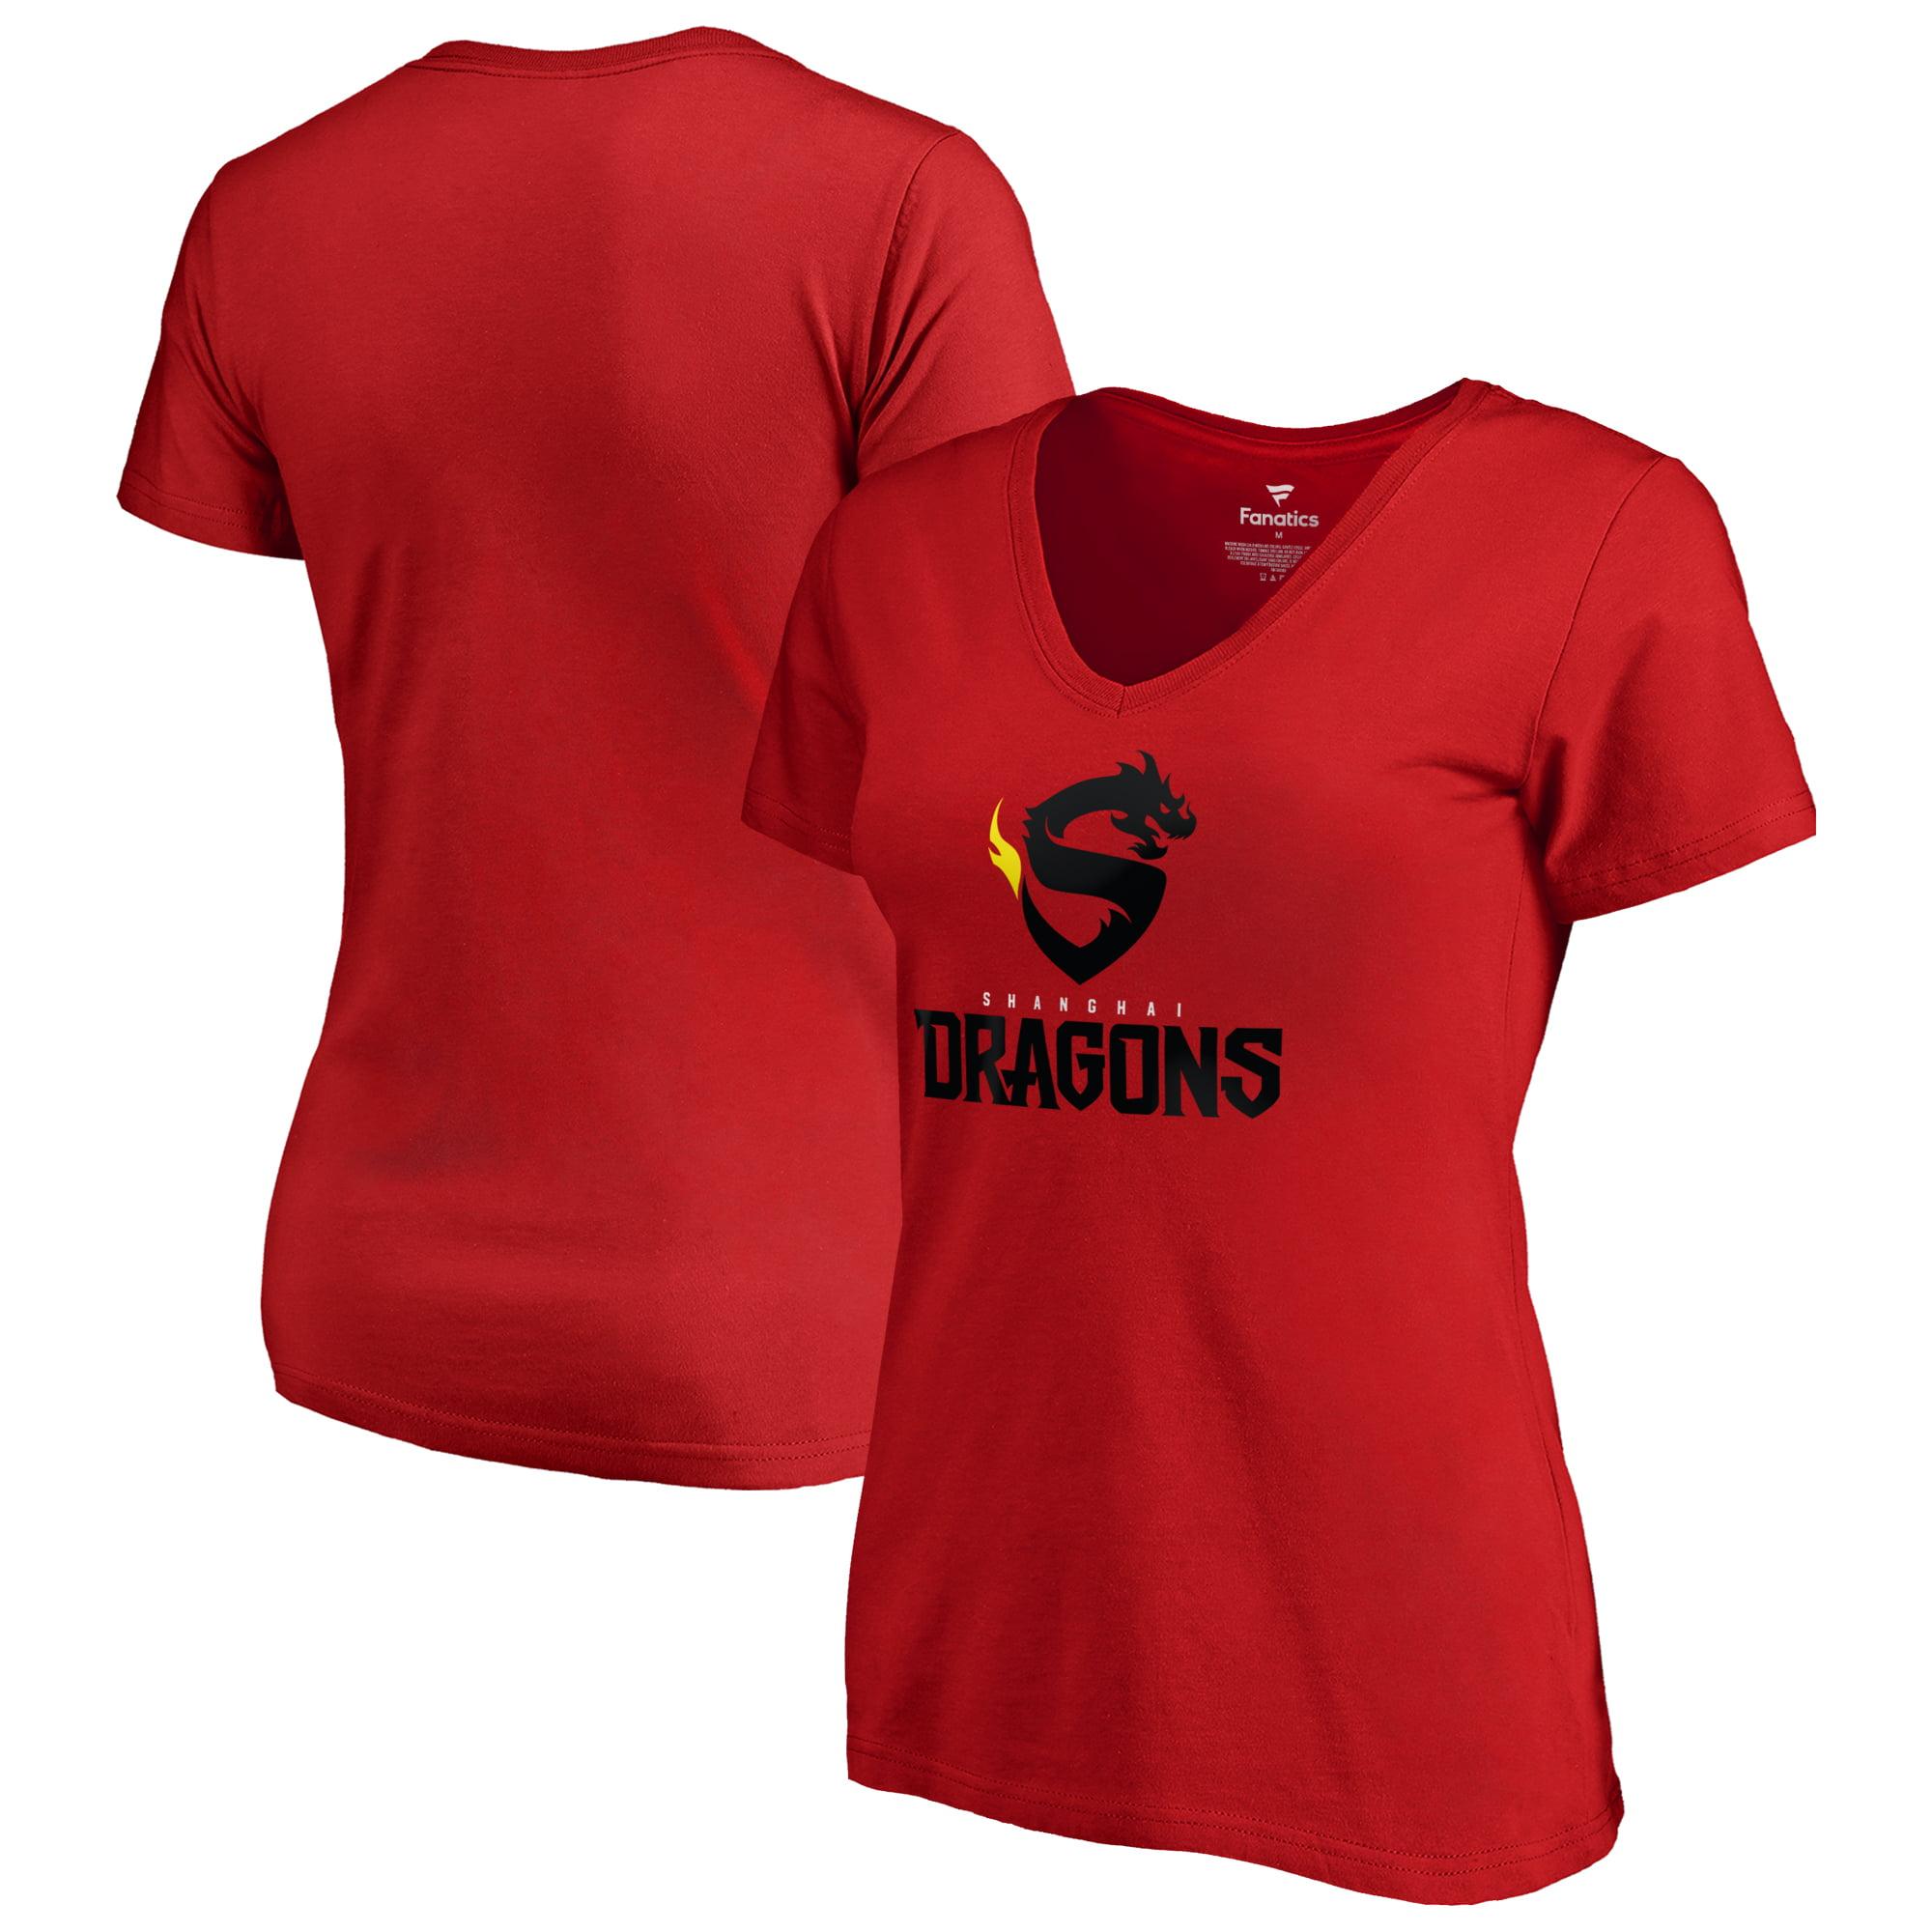 Shanghai Dragons Fanatics Branded Women's Team Identity V-Neck T-Shirt - Red